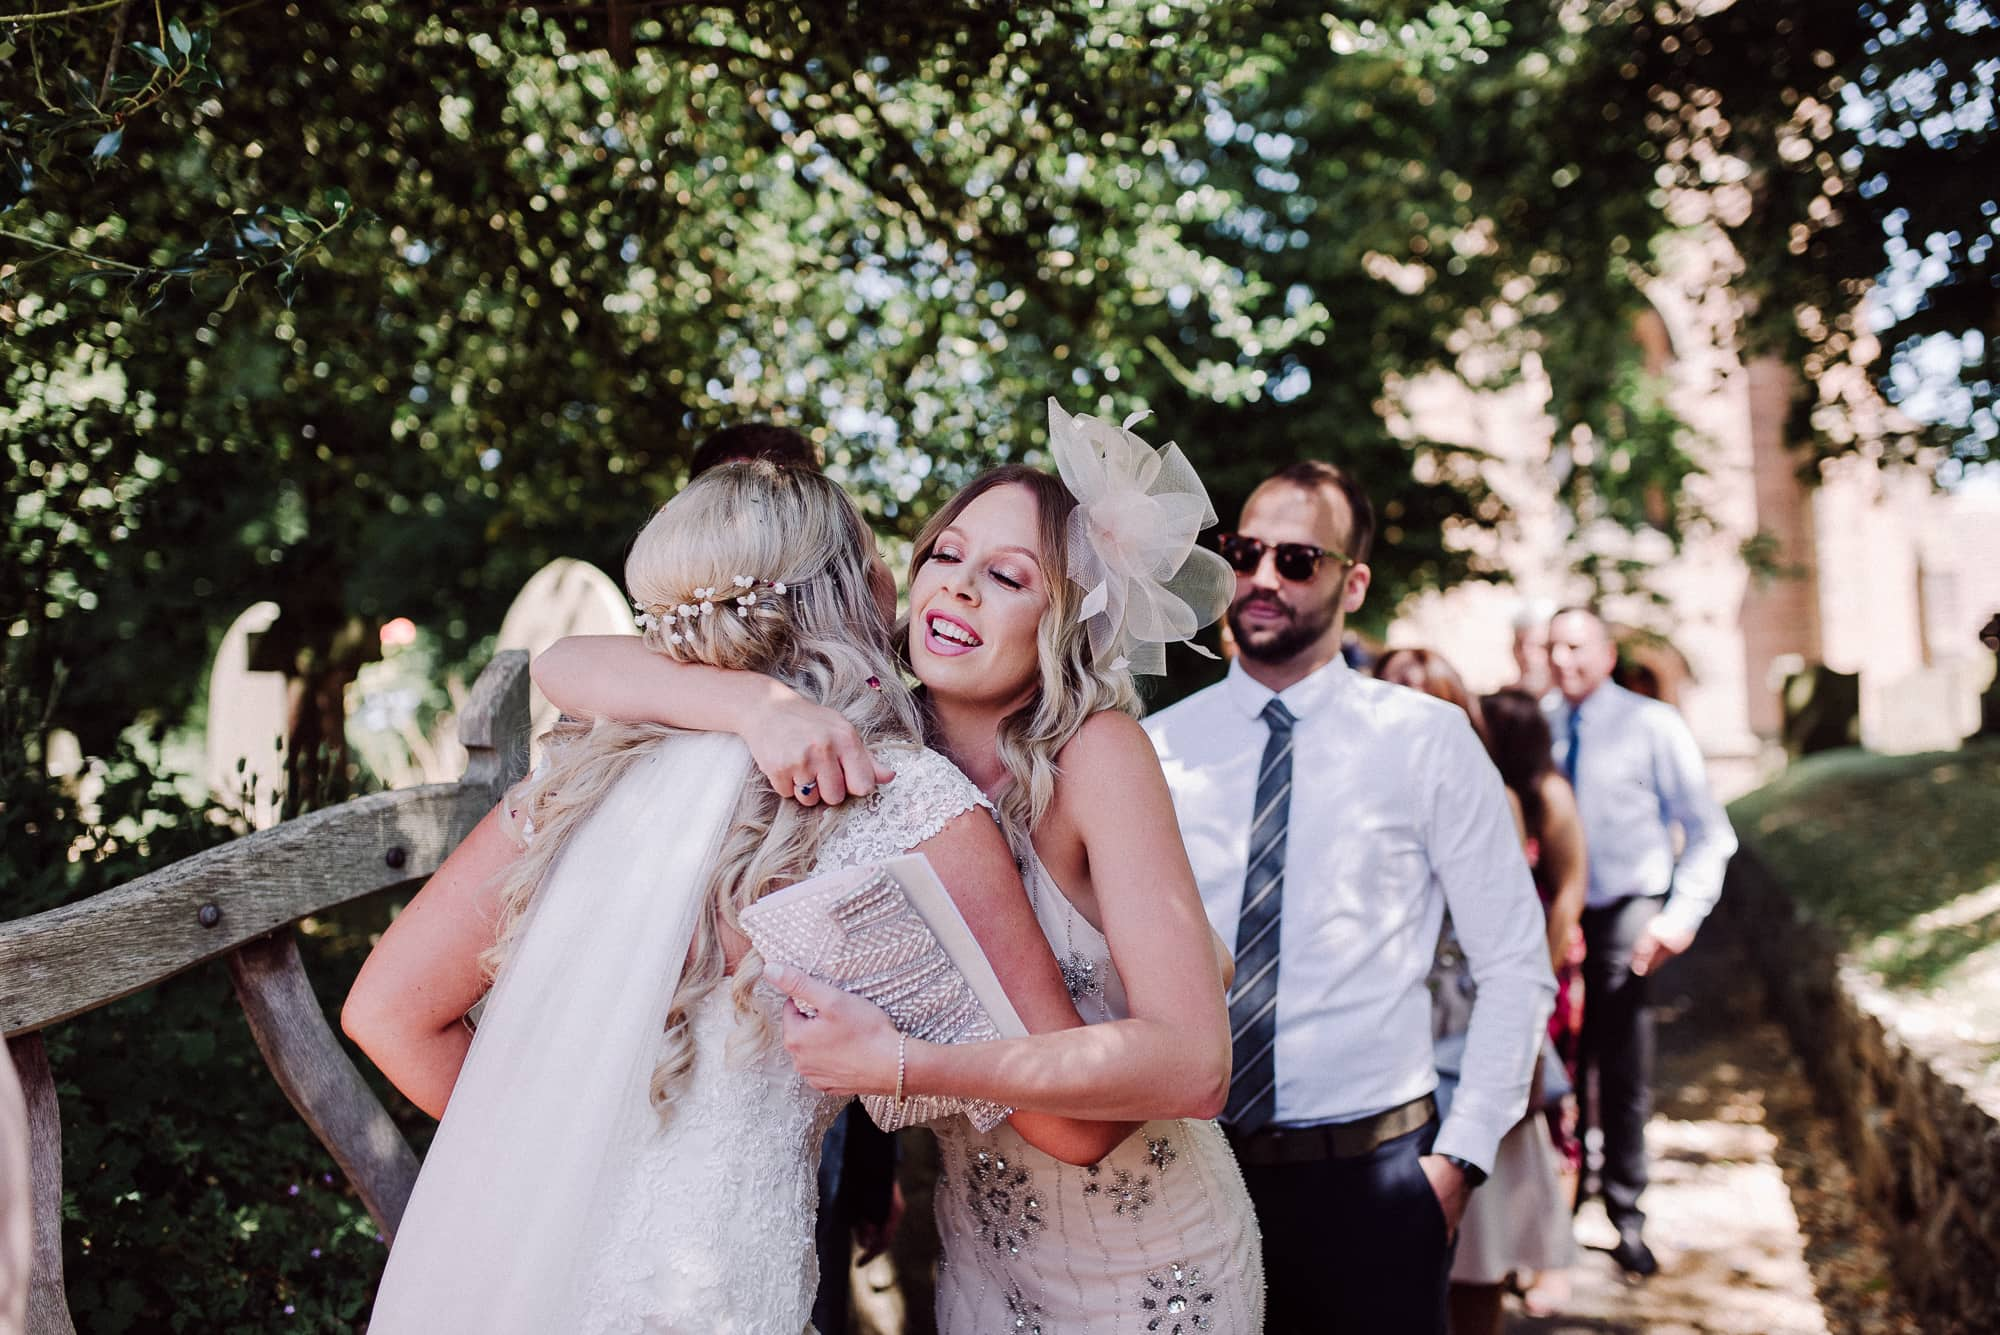 Post Wedding Photographs Tianna J-Williams Photography Somerford Hall